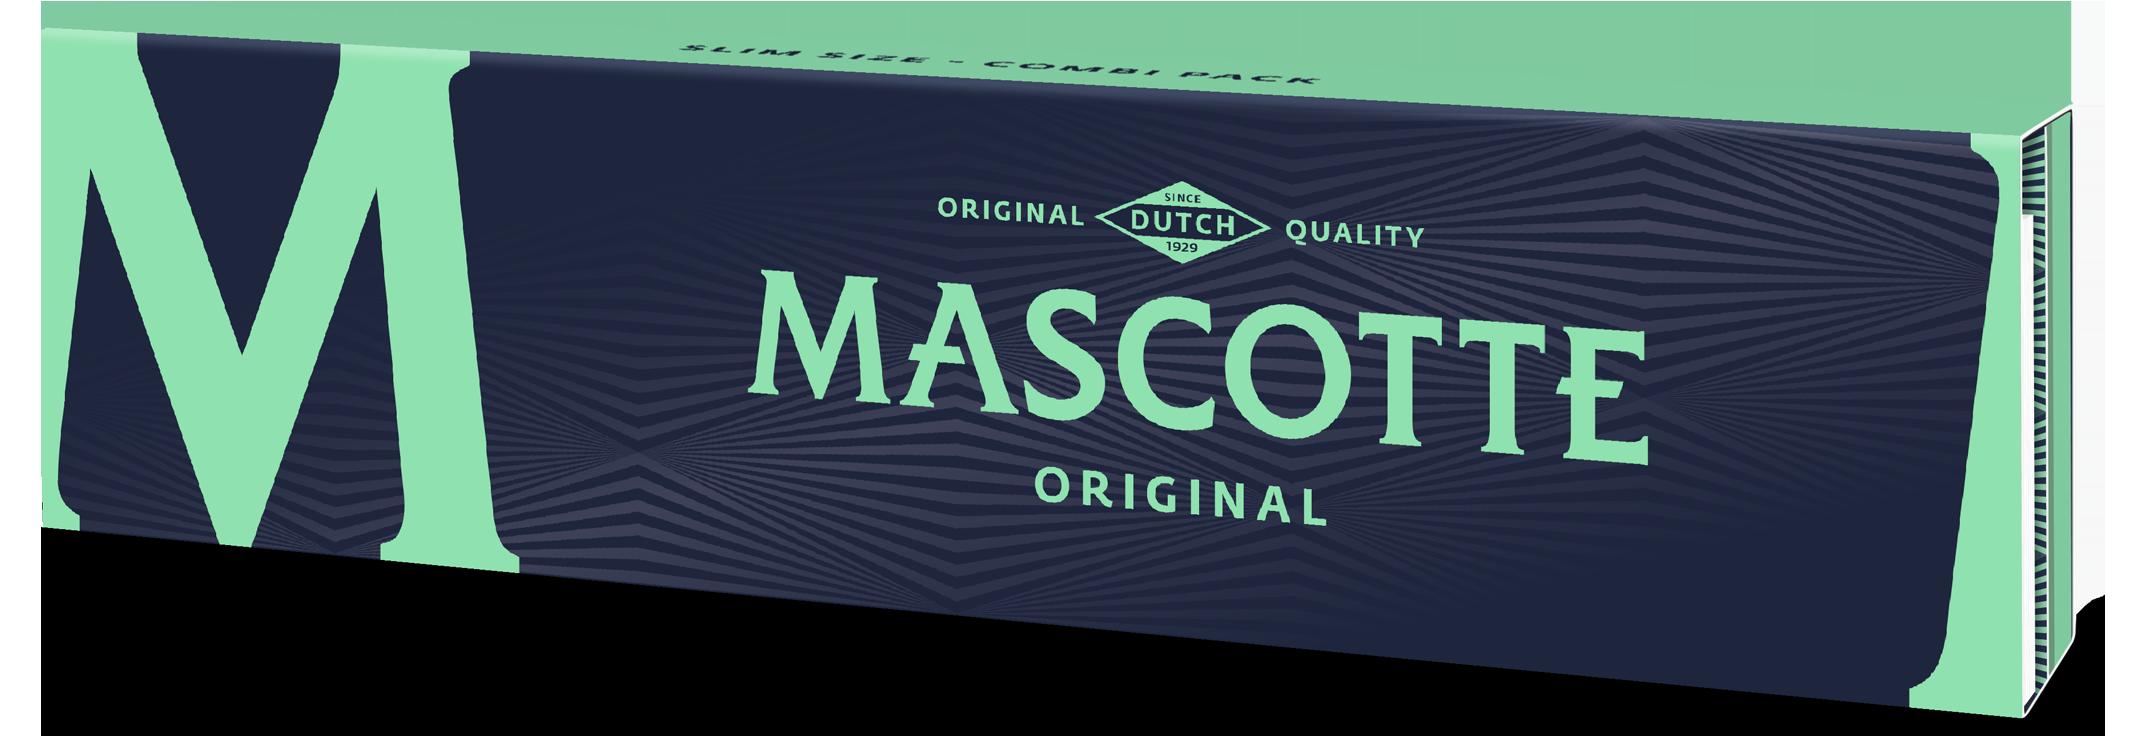 Original combi (Slim Size with magnet + tips) - Mascotte